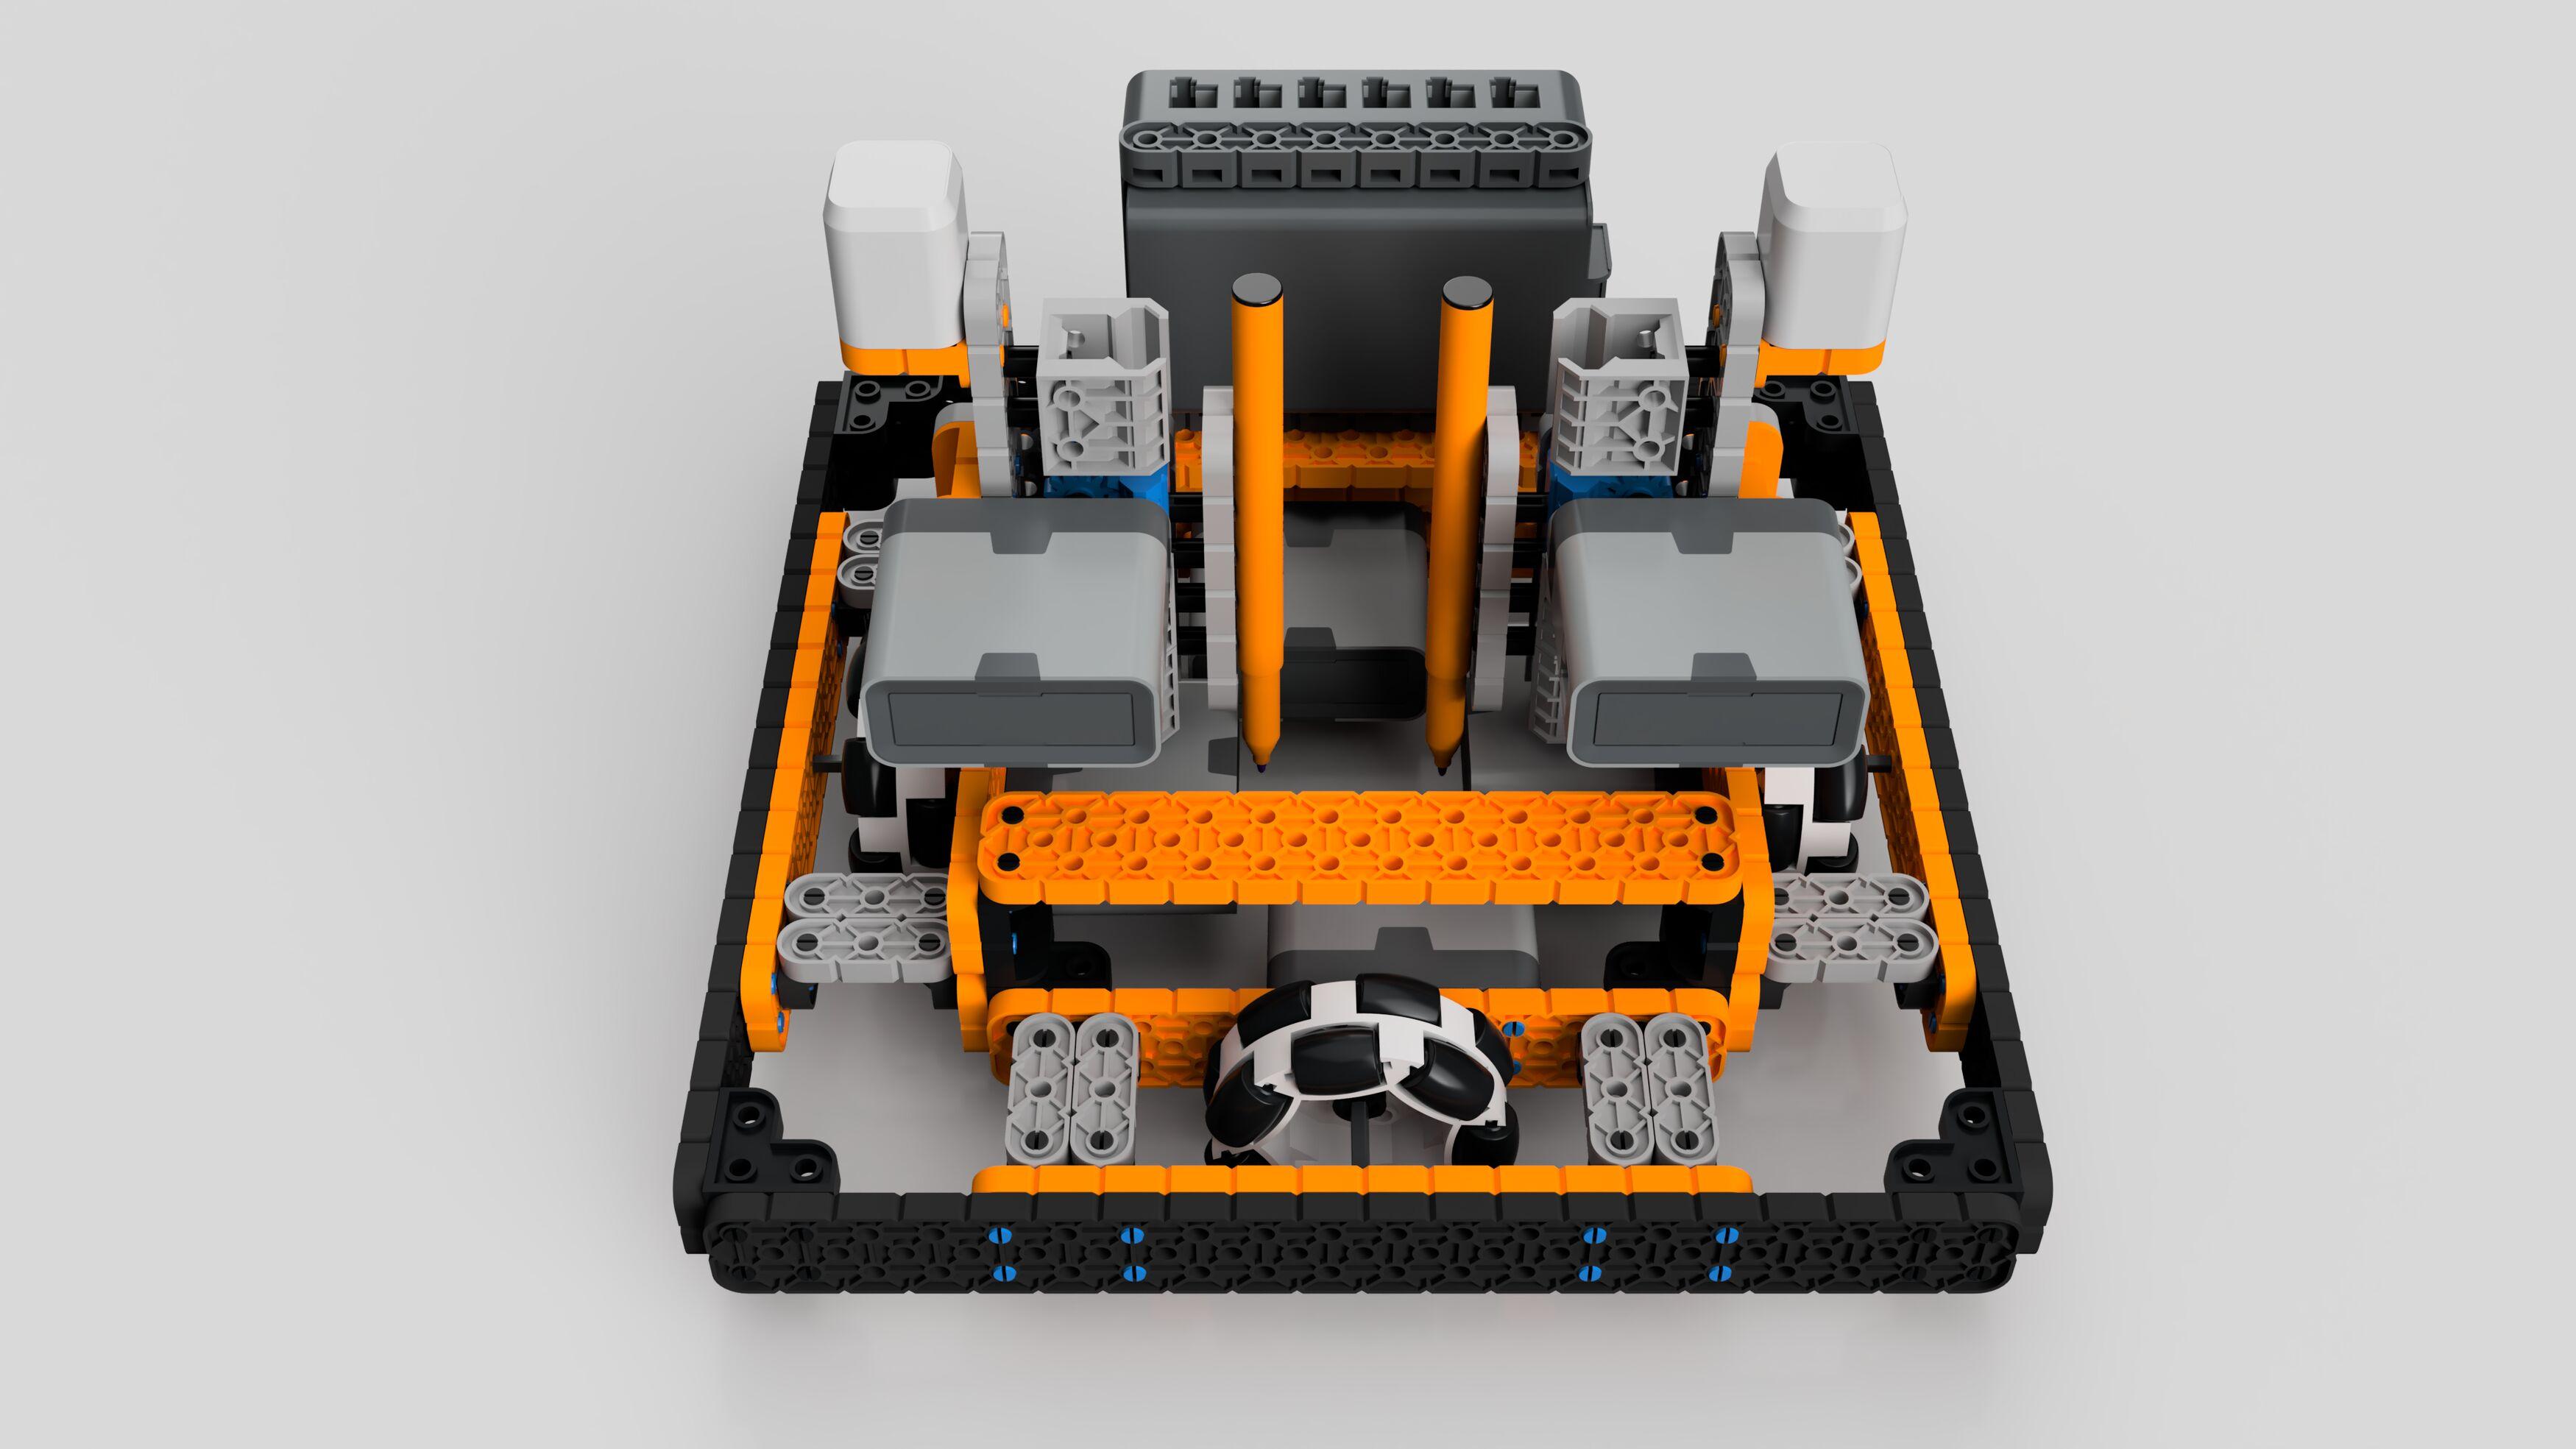 Robotics-pen-oficial-2-cores---fabrica-de-nerdes-2020-may-28-08-03-39pm-000-customizedview13534389500-png-3500-3500